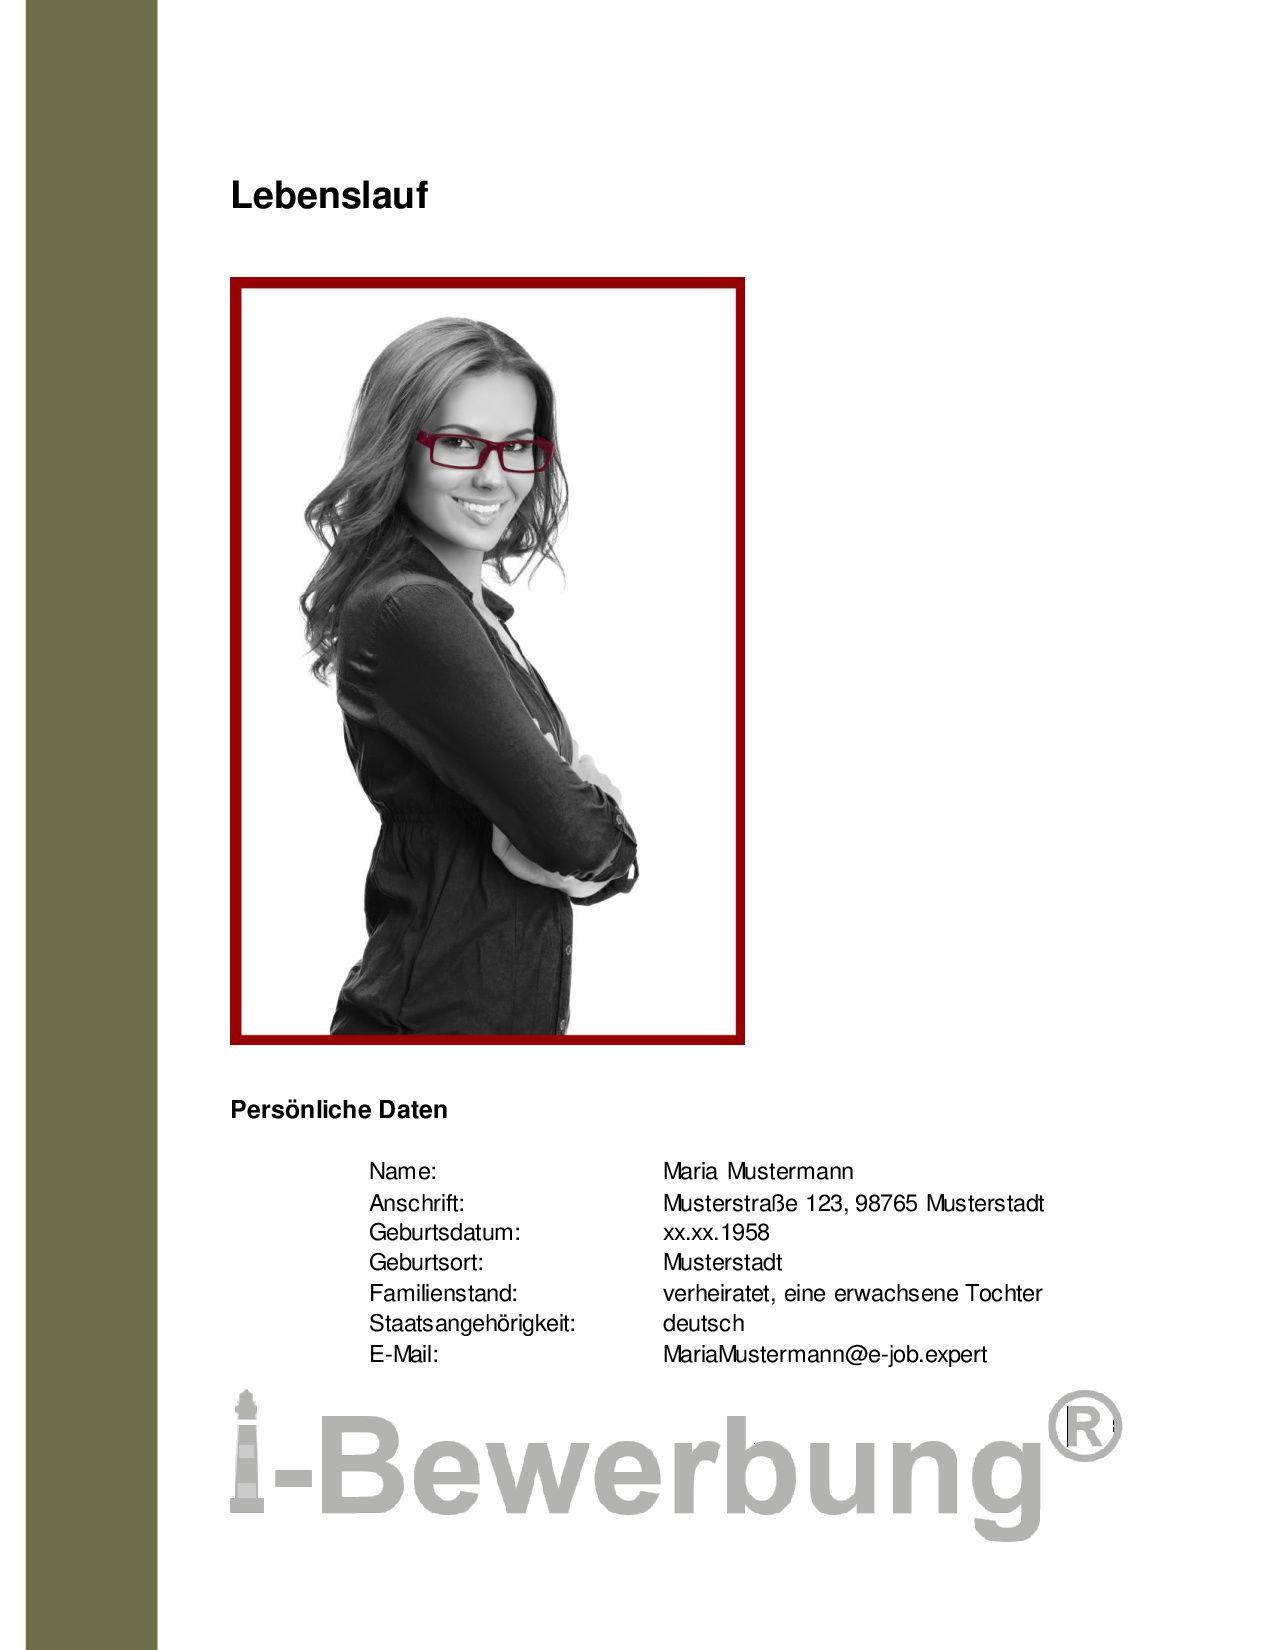 Berühmt Studenten Lebenslauf Fähigkeiten Fotos - Entry Level Resume ...